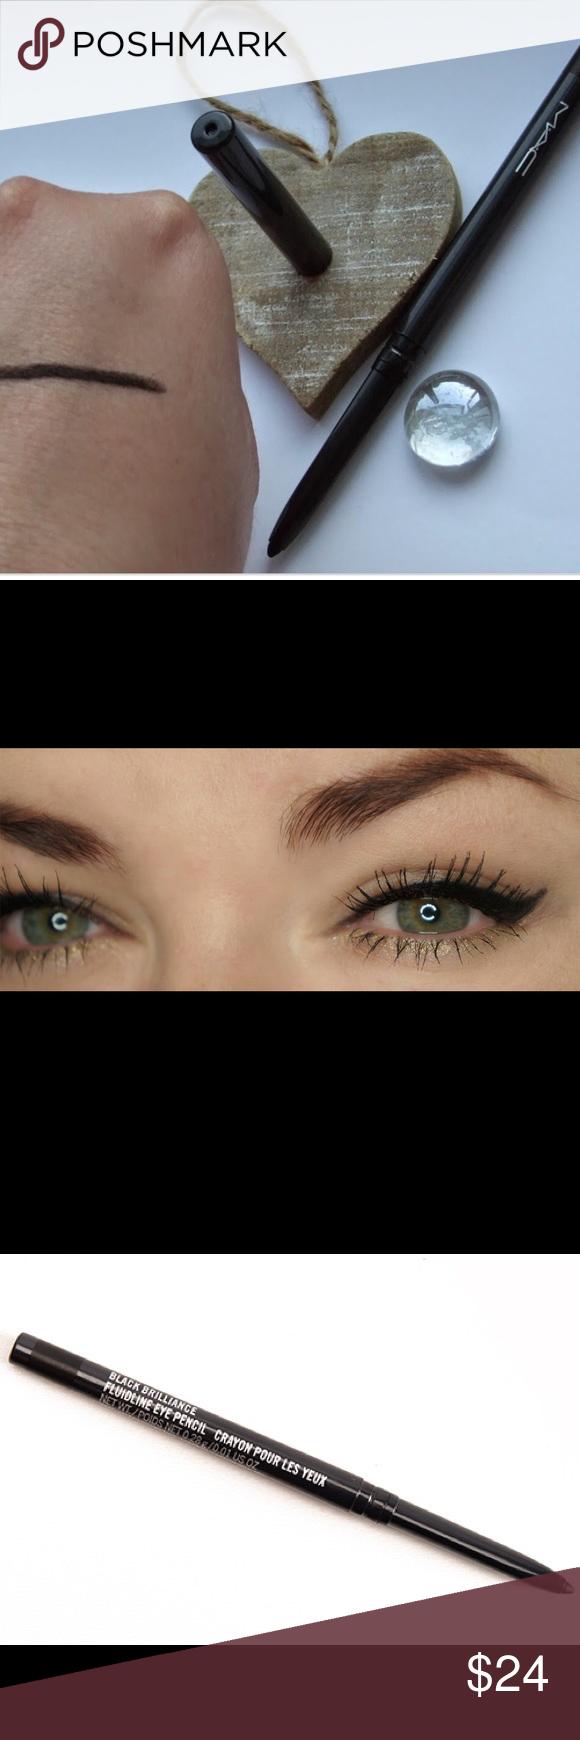 BLACK BRILL DISCONT MAC Fluidline Eyeliner NWT Boutique